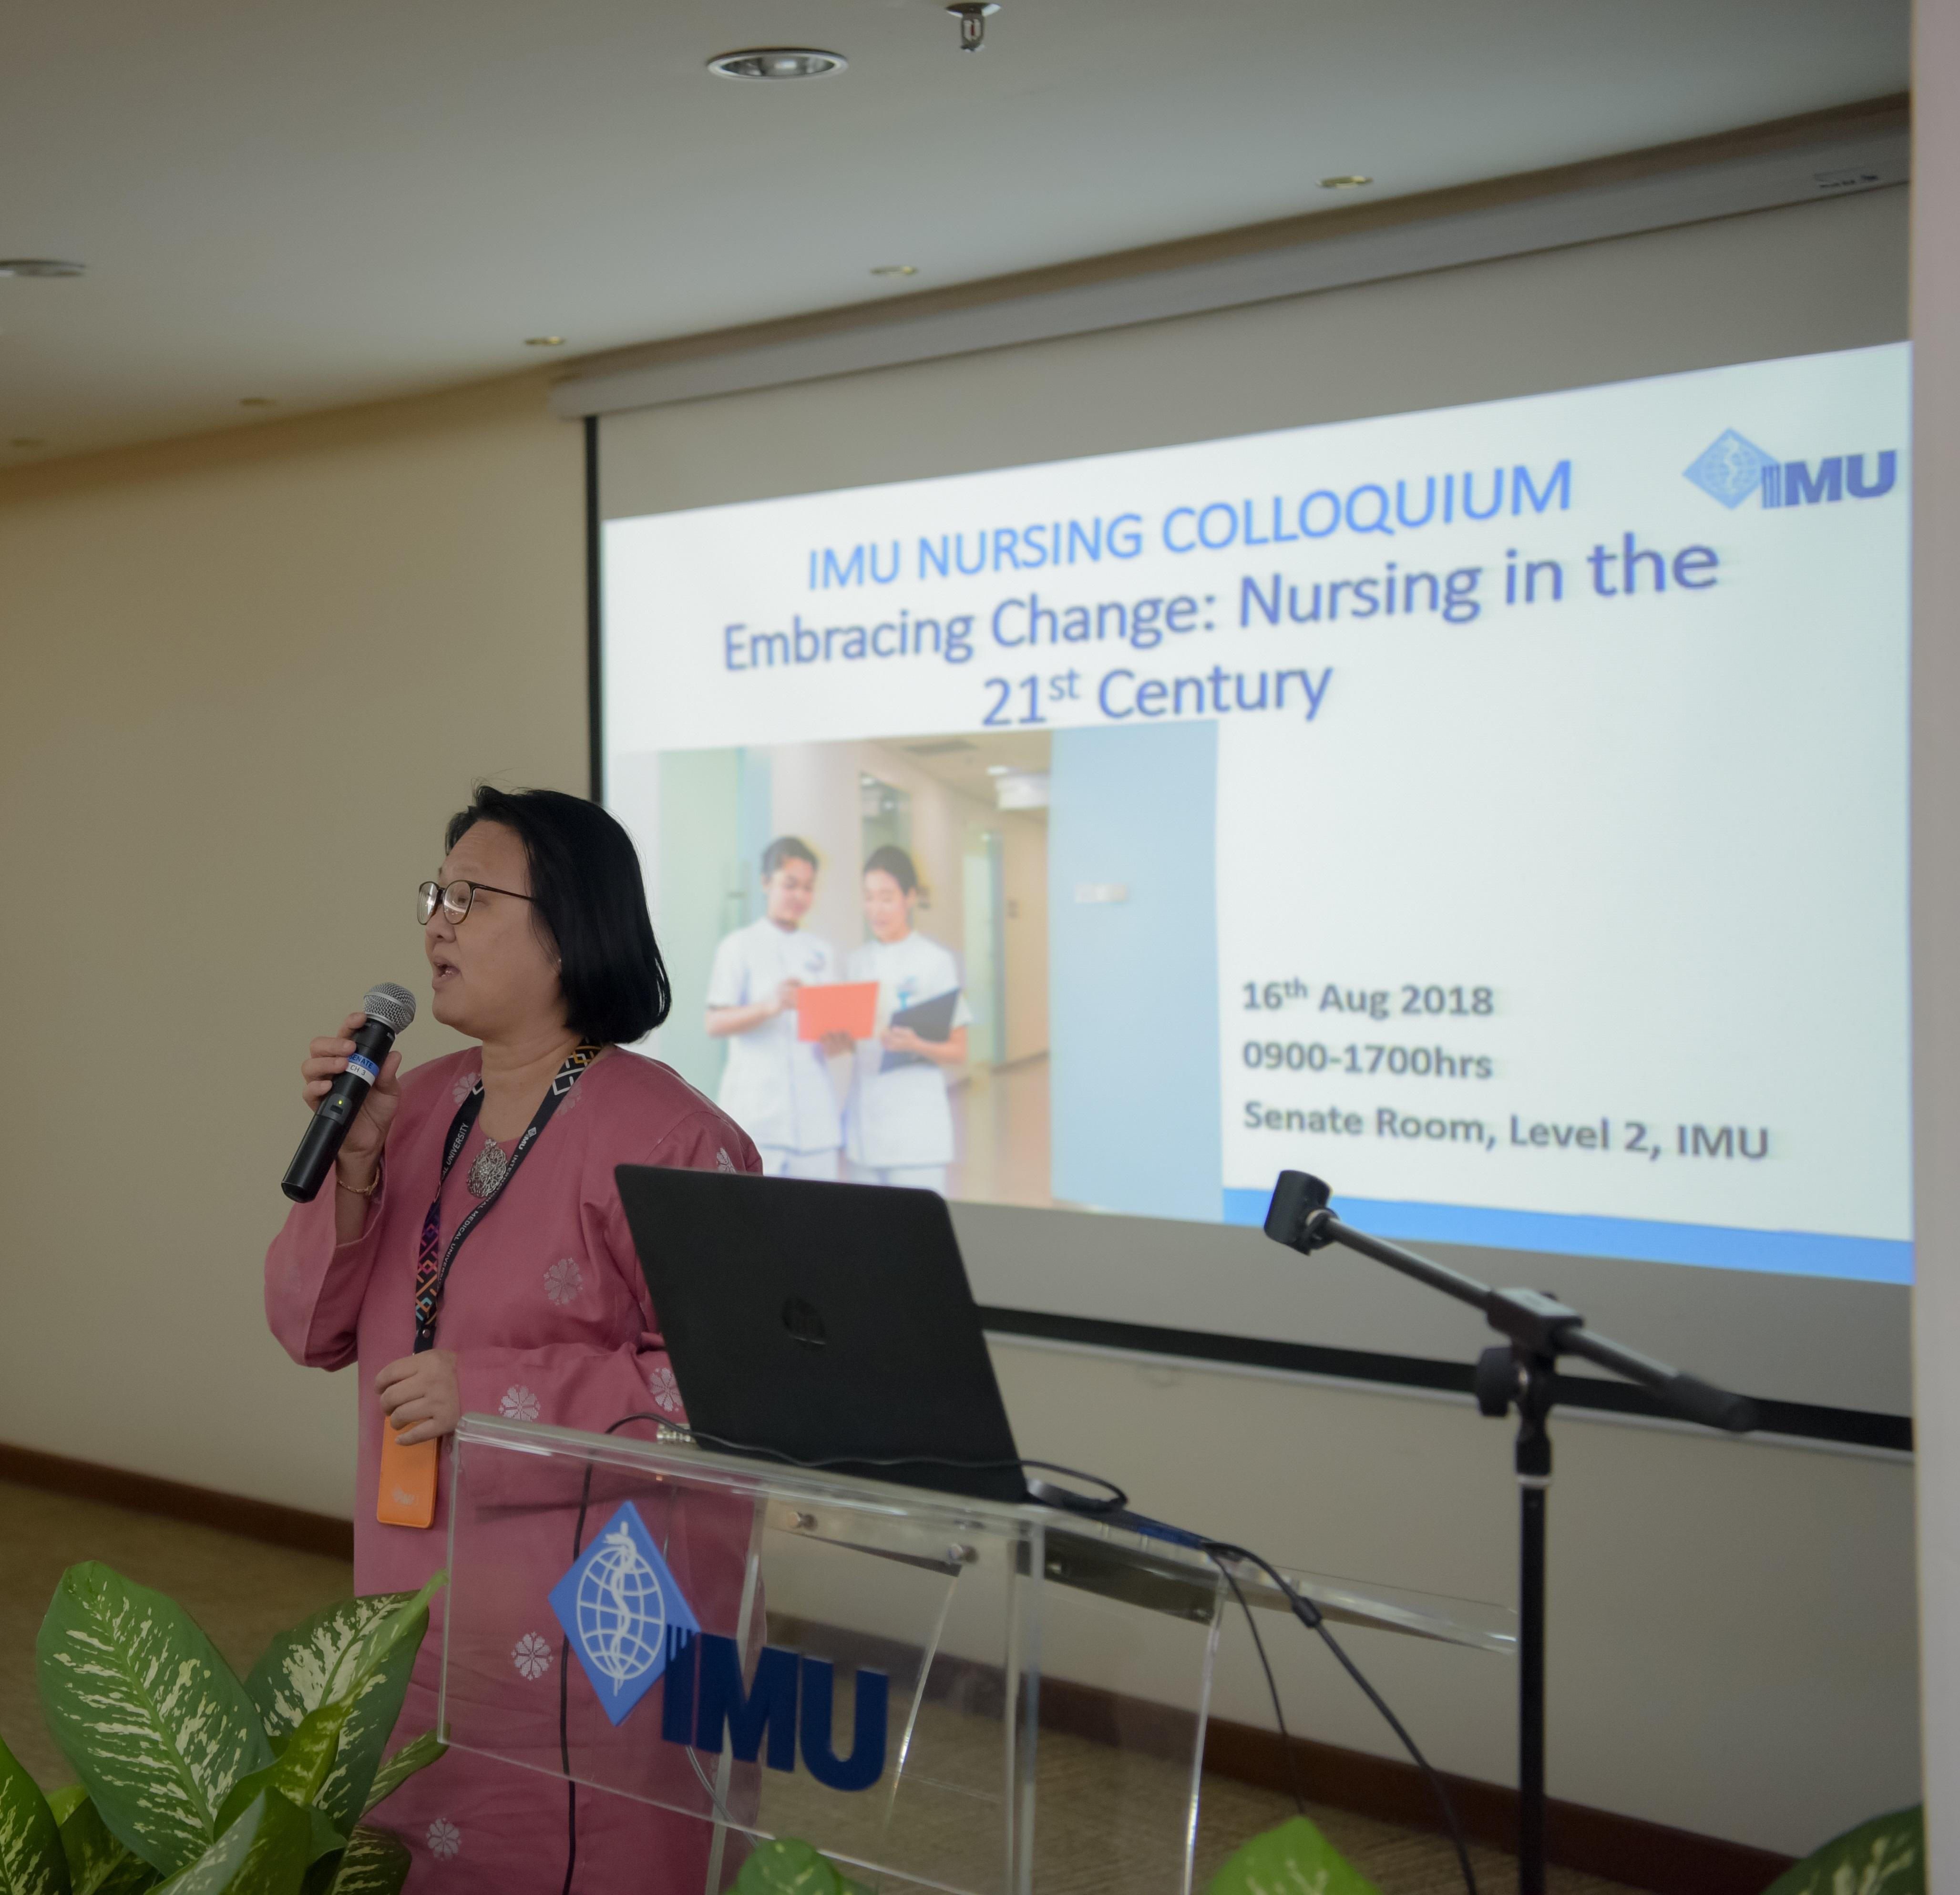 nursing challenges in the 21st century